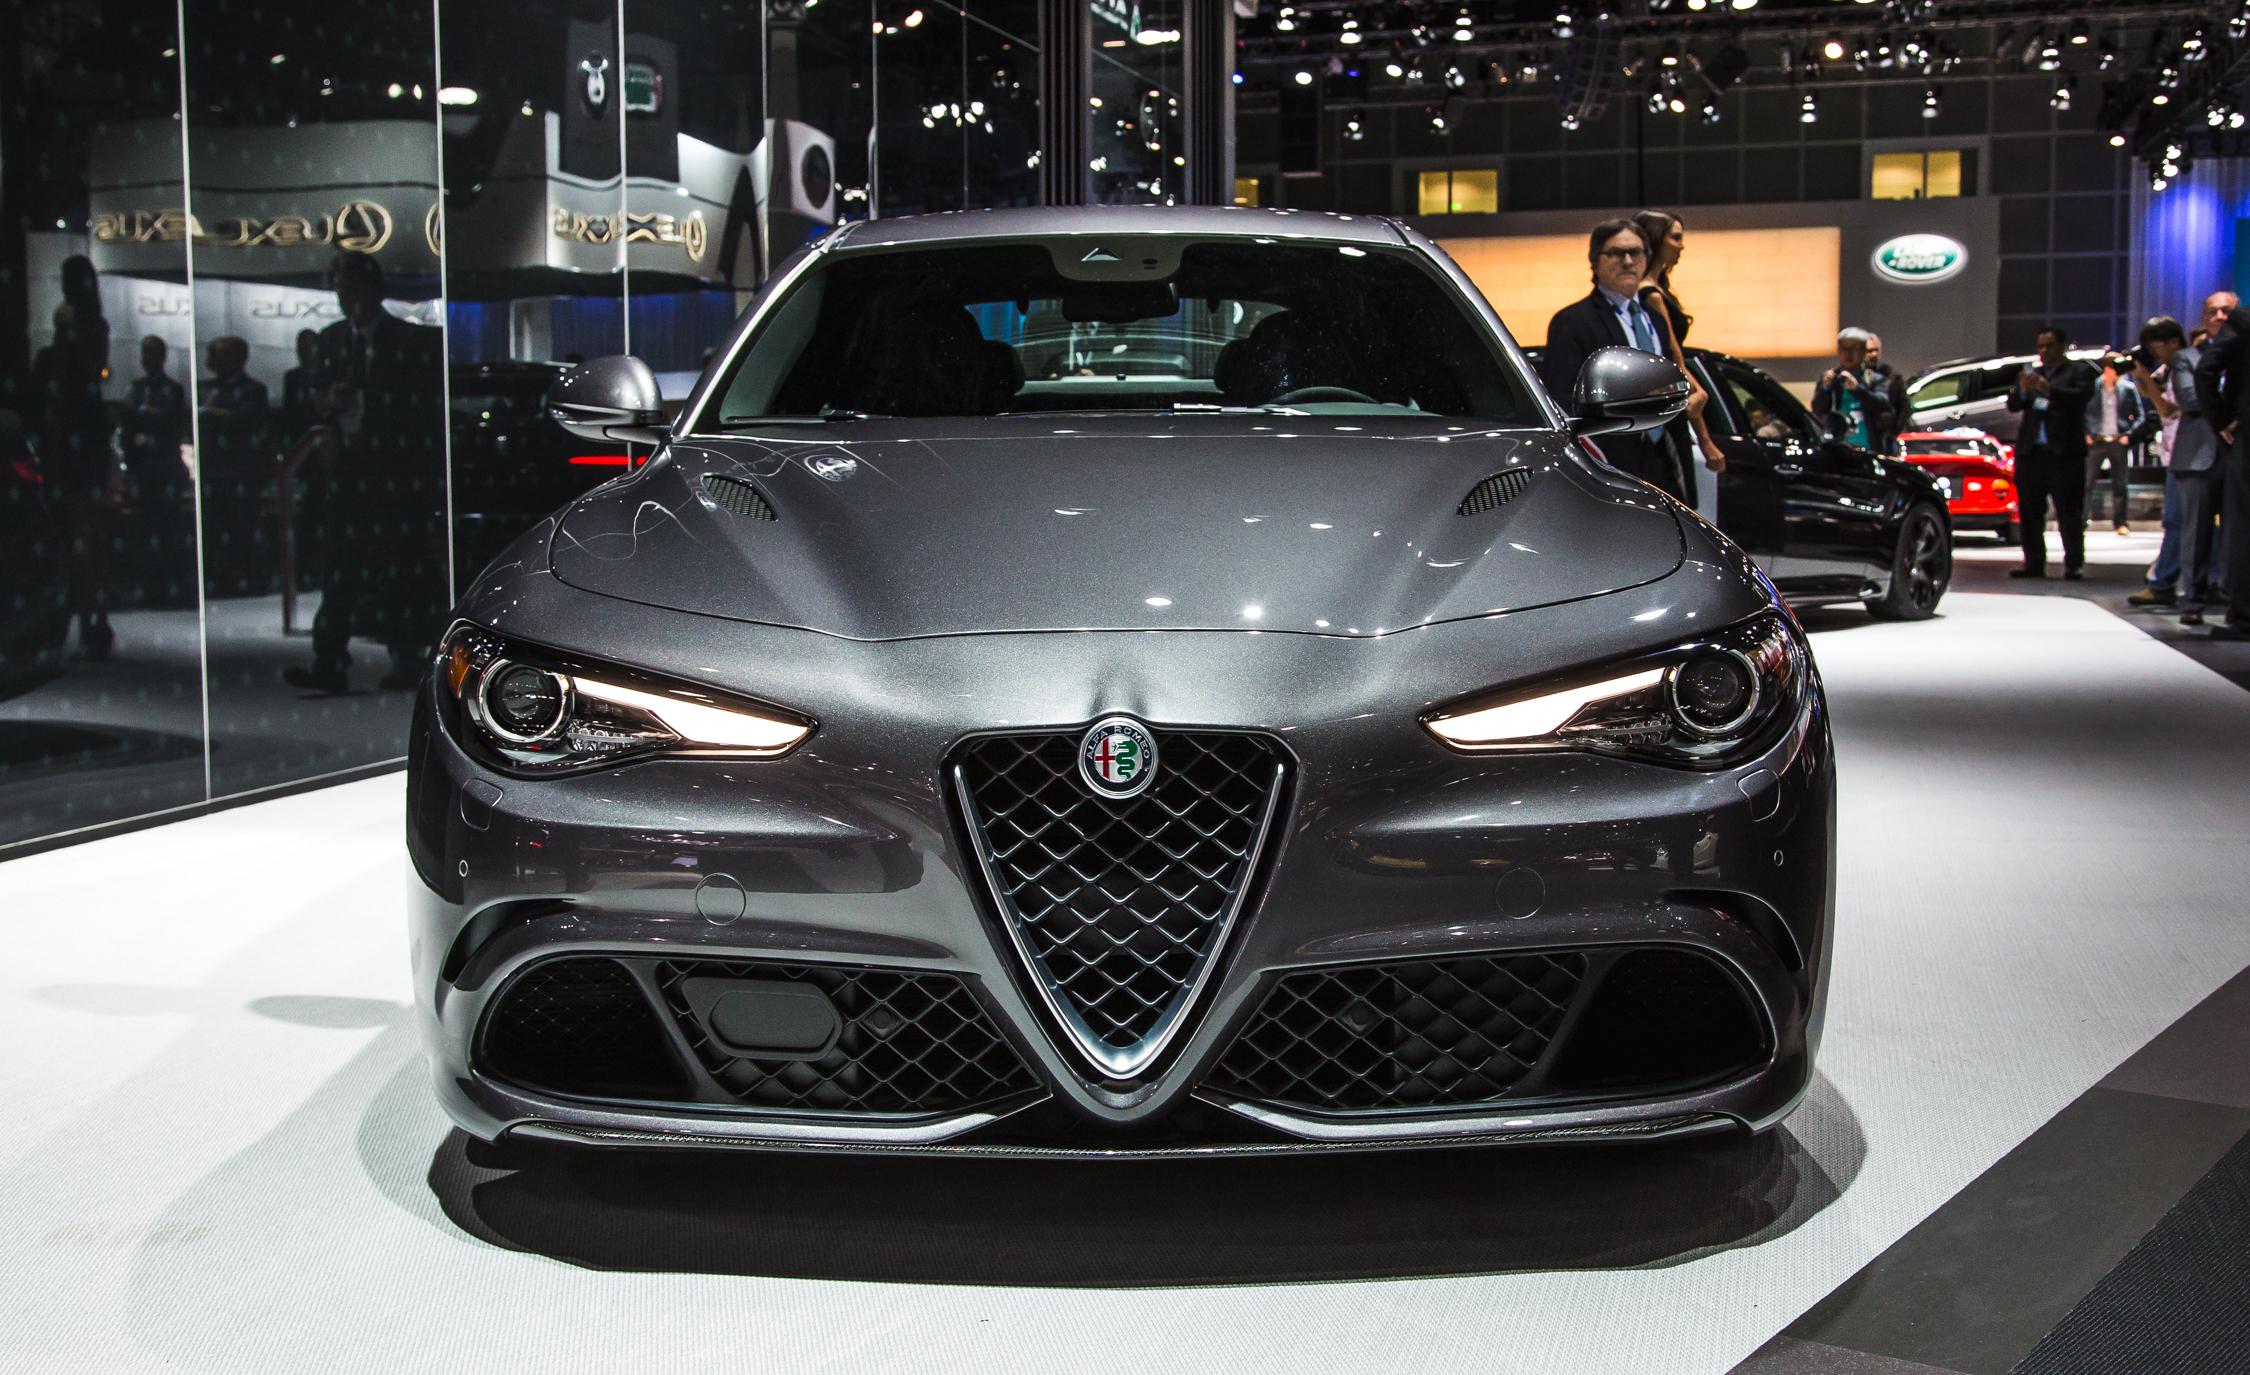 2017 Alfa Romeo Giulia Quadrifoglio Front End Exterior